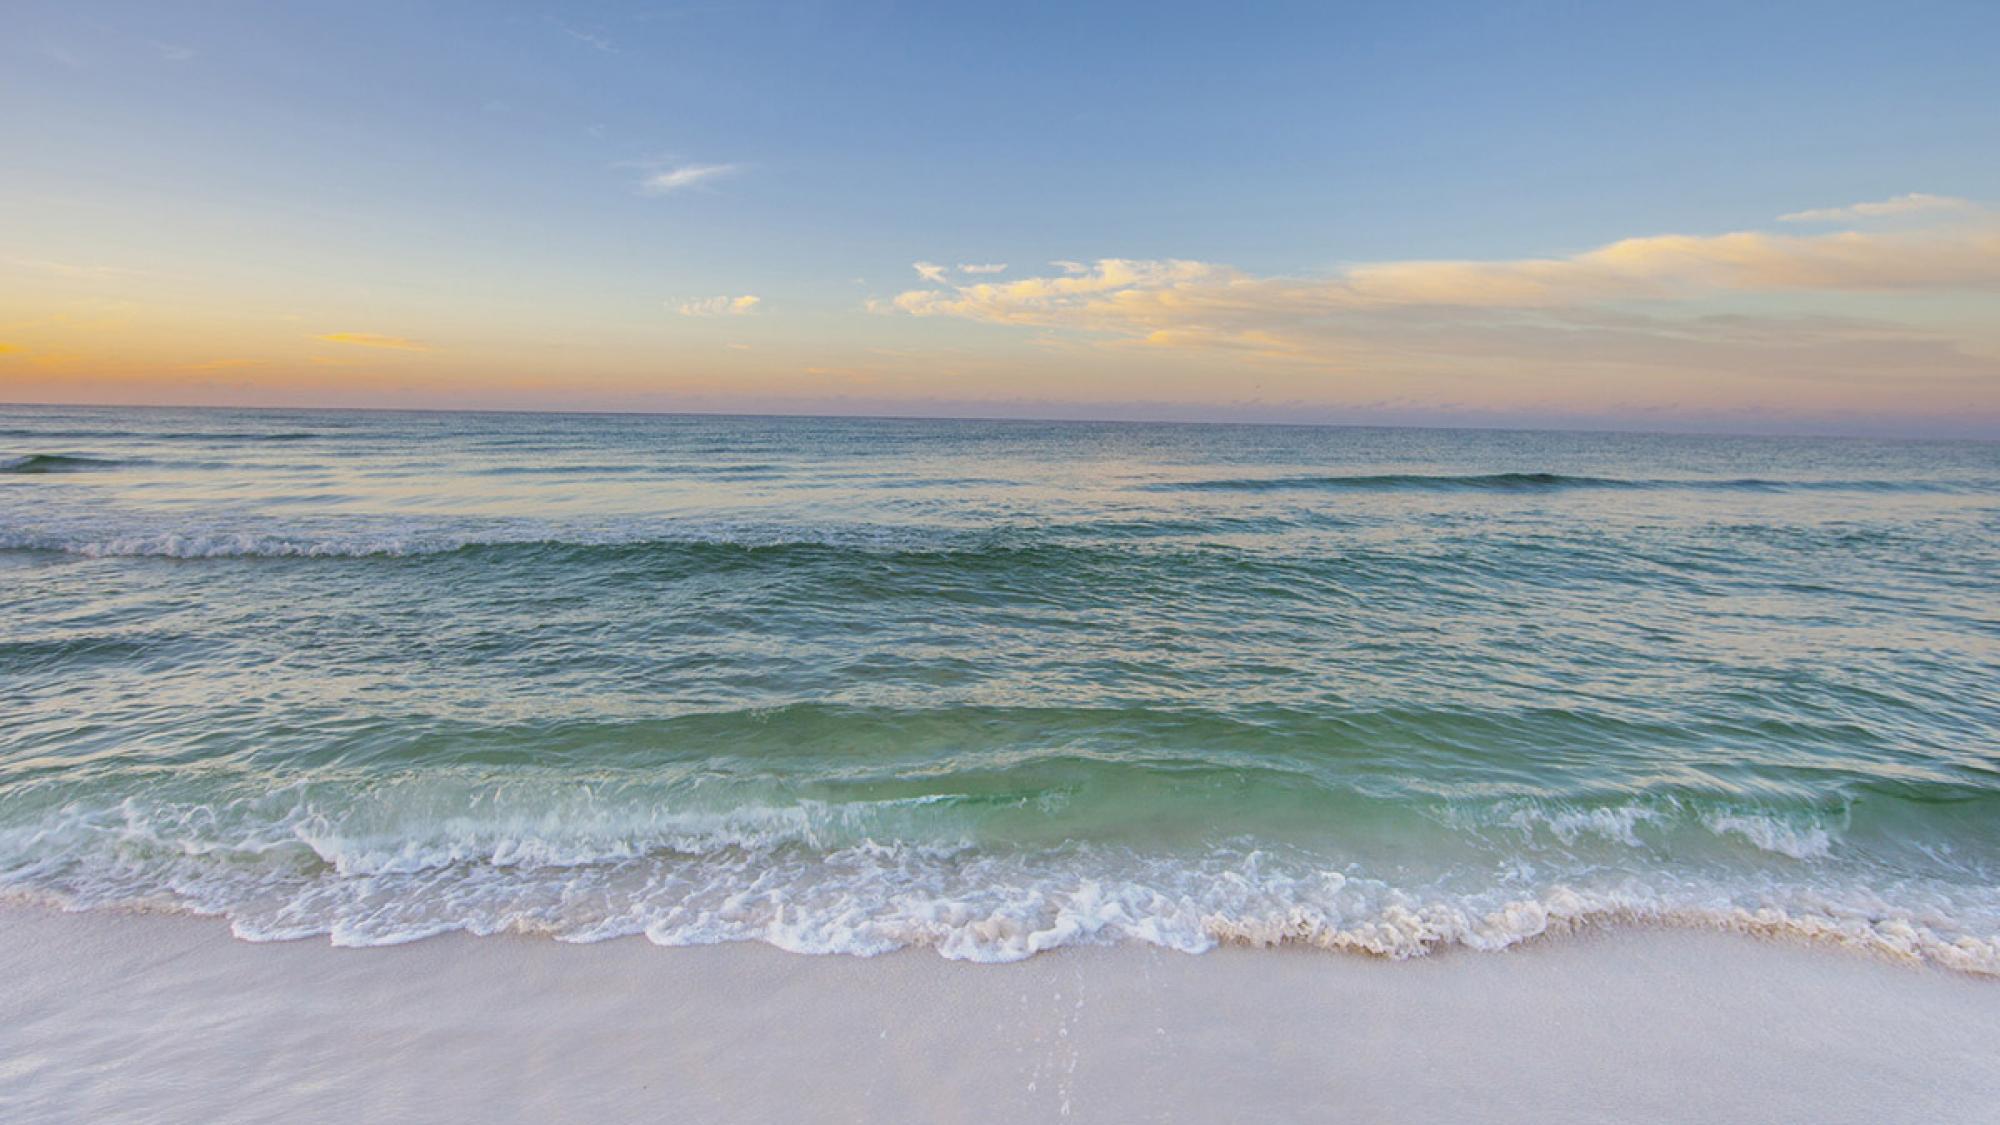 Seascape HD wallpapers, Desktop wallpaper - most viewed